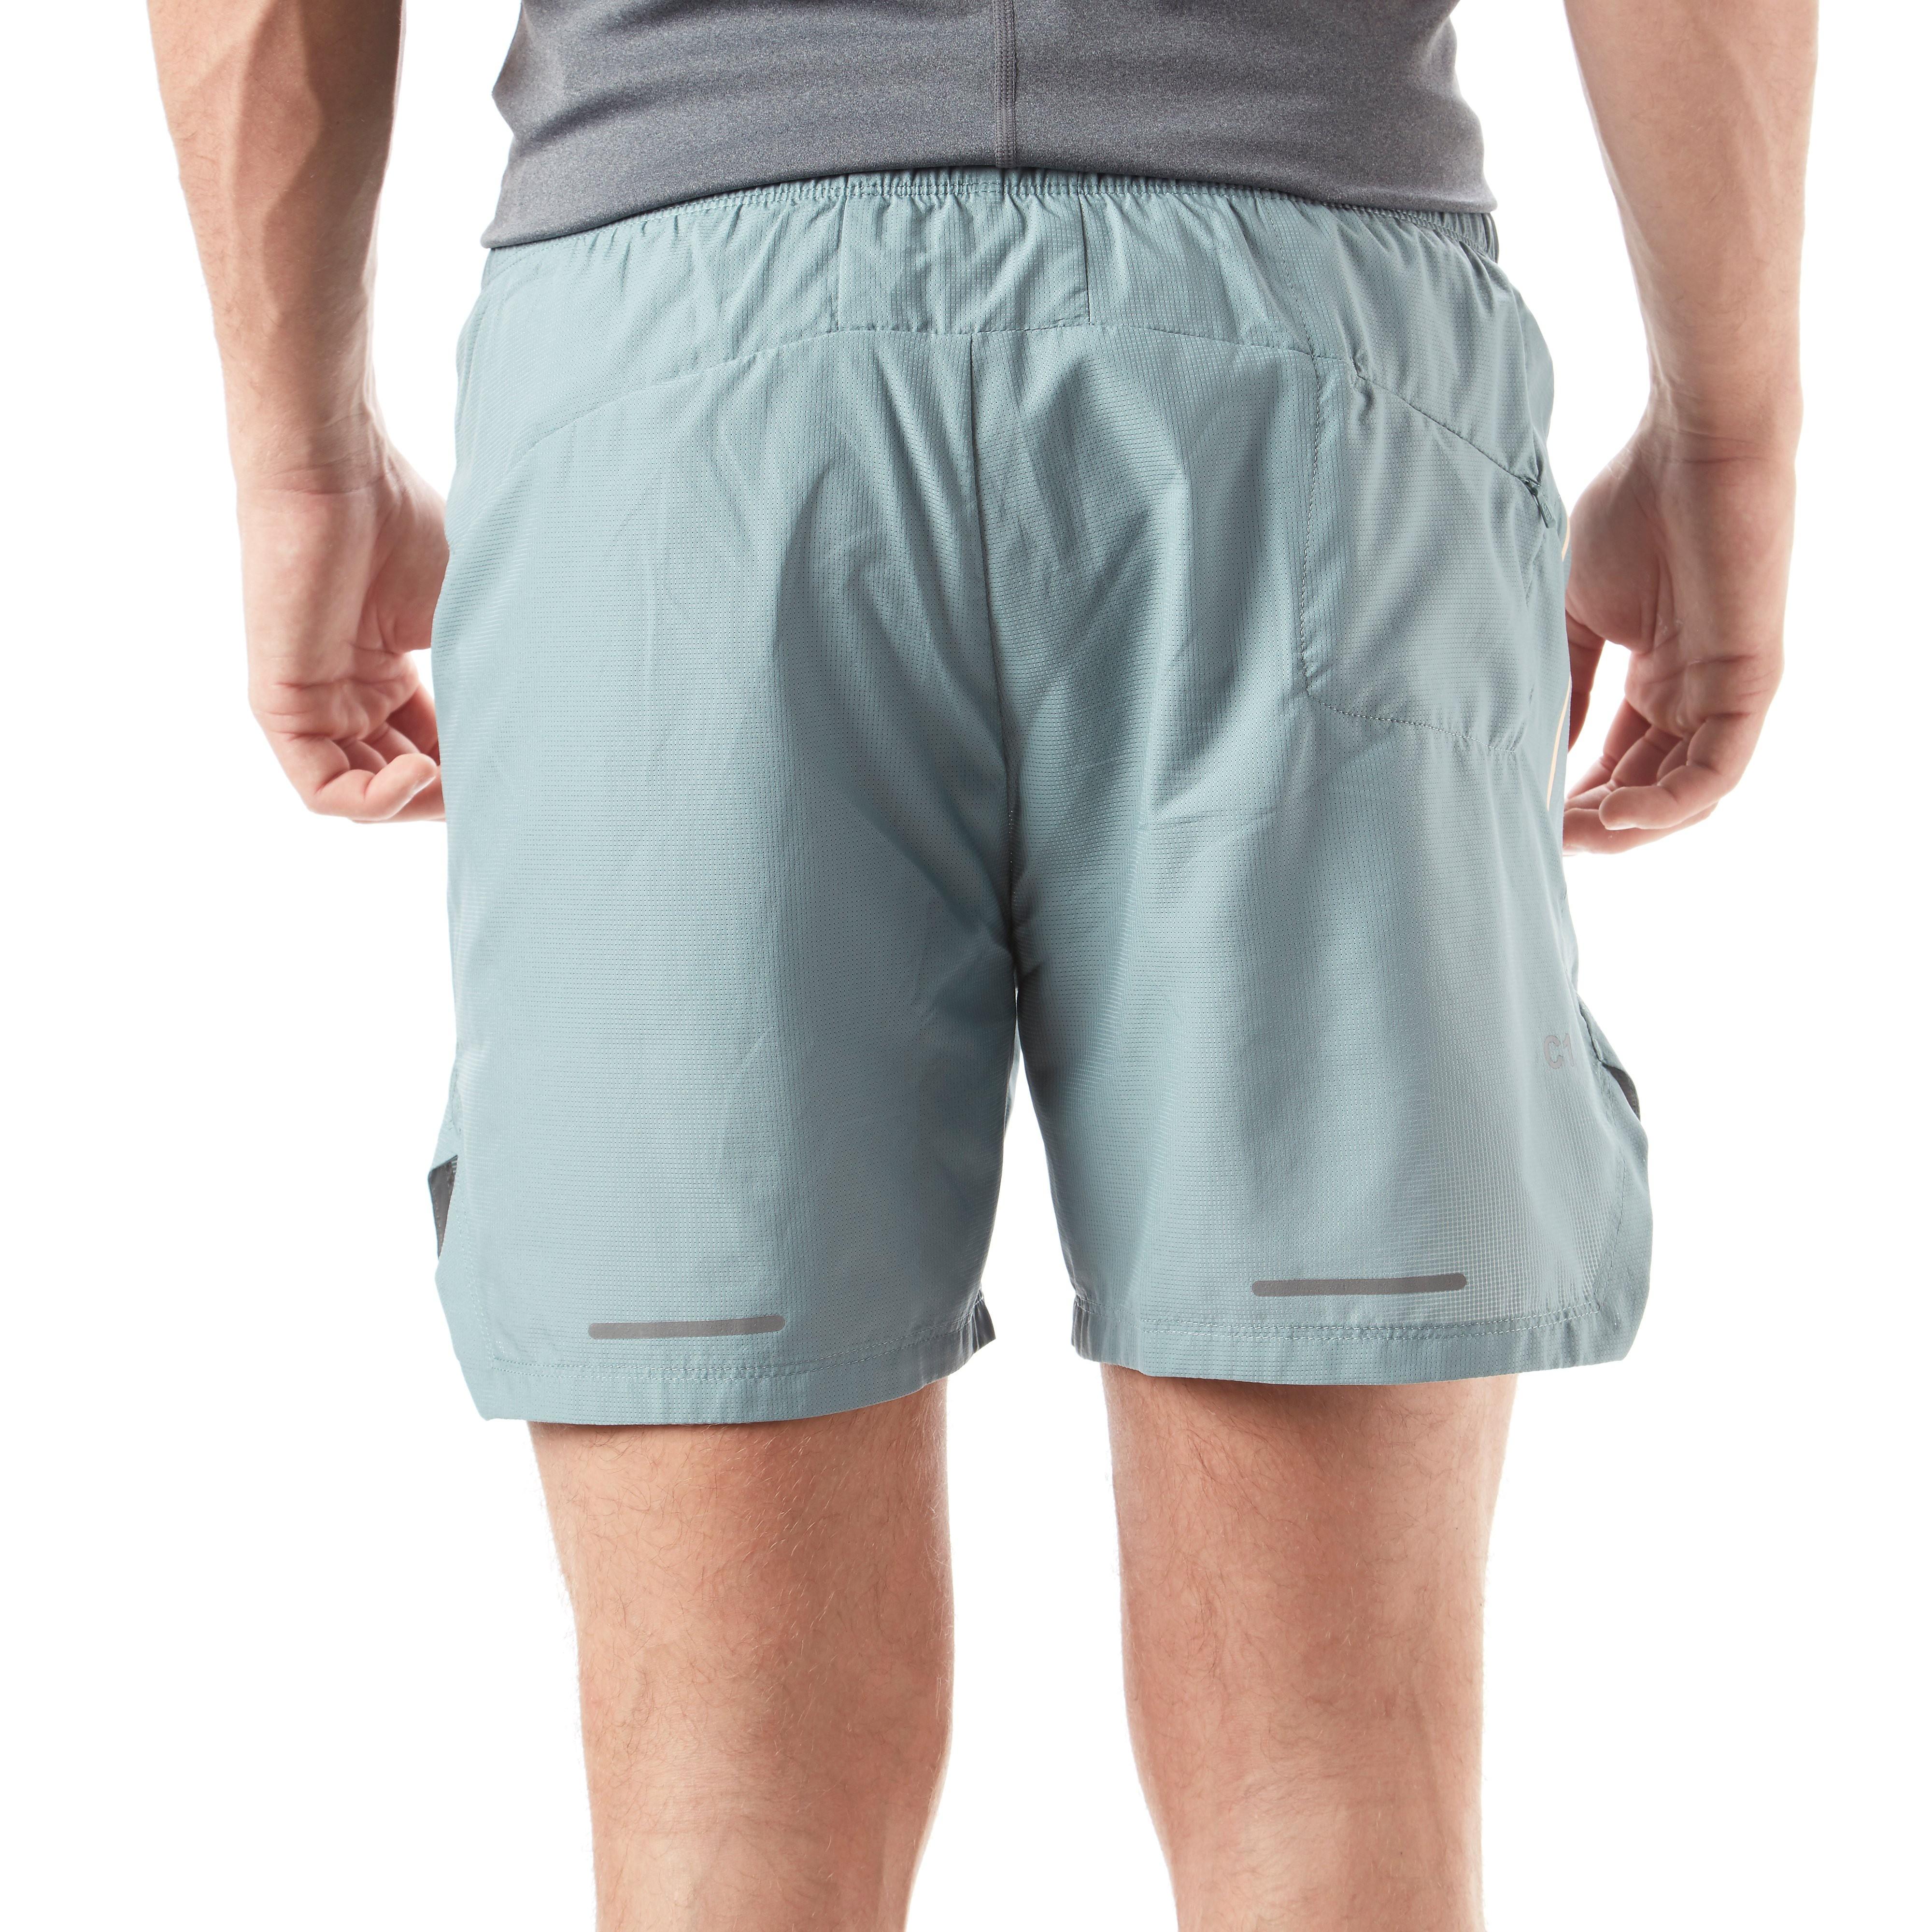 "Asics Cool 2in1 5"" Men's Running Shorts"